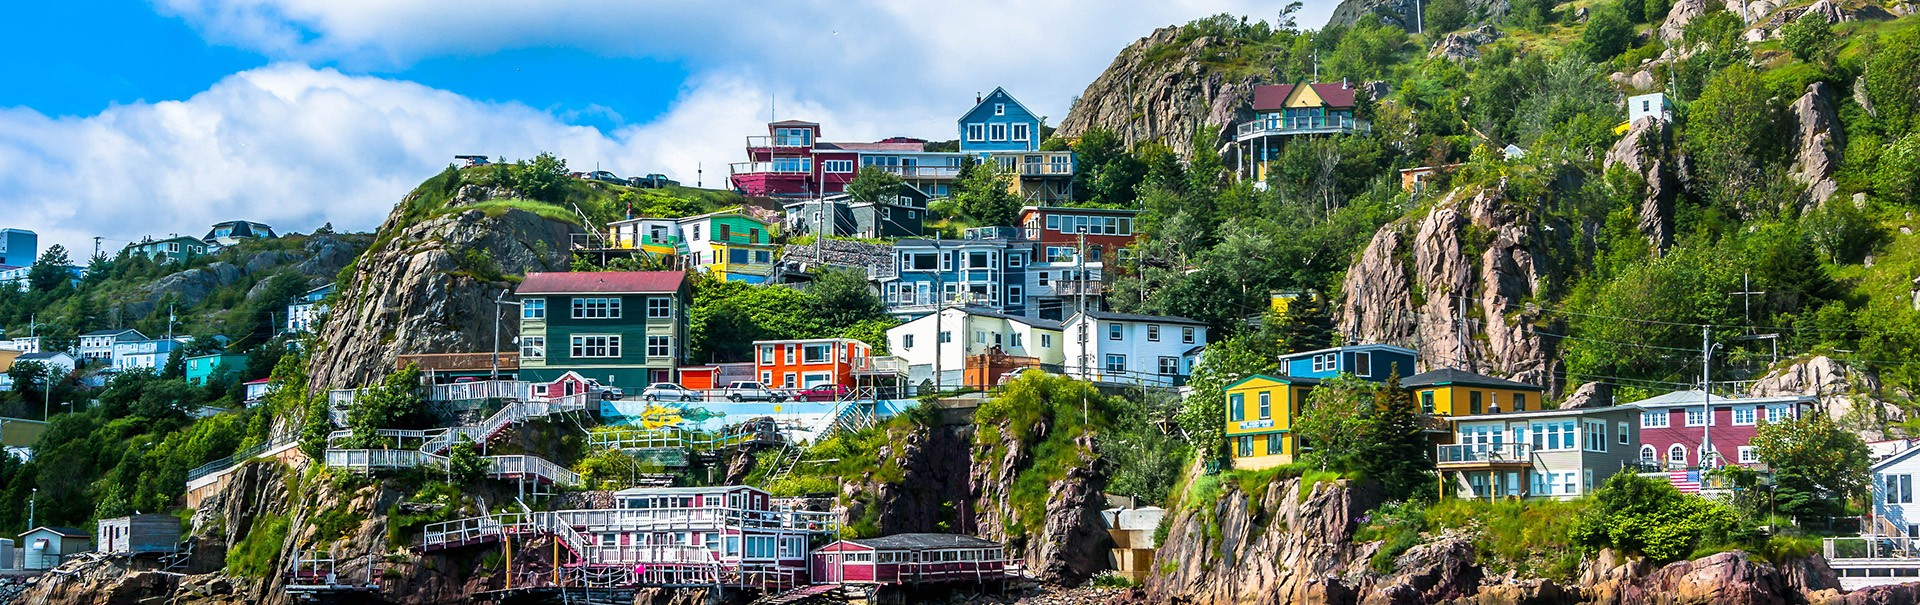 Educatius-NewfoundlandLabradorSchoolDistrict-StJohnsIsland-Banner-2019